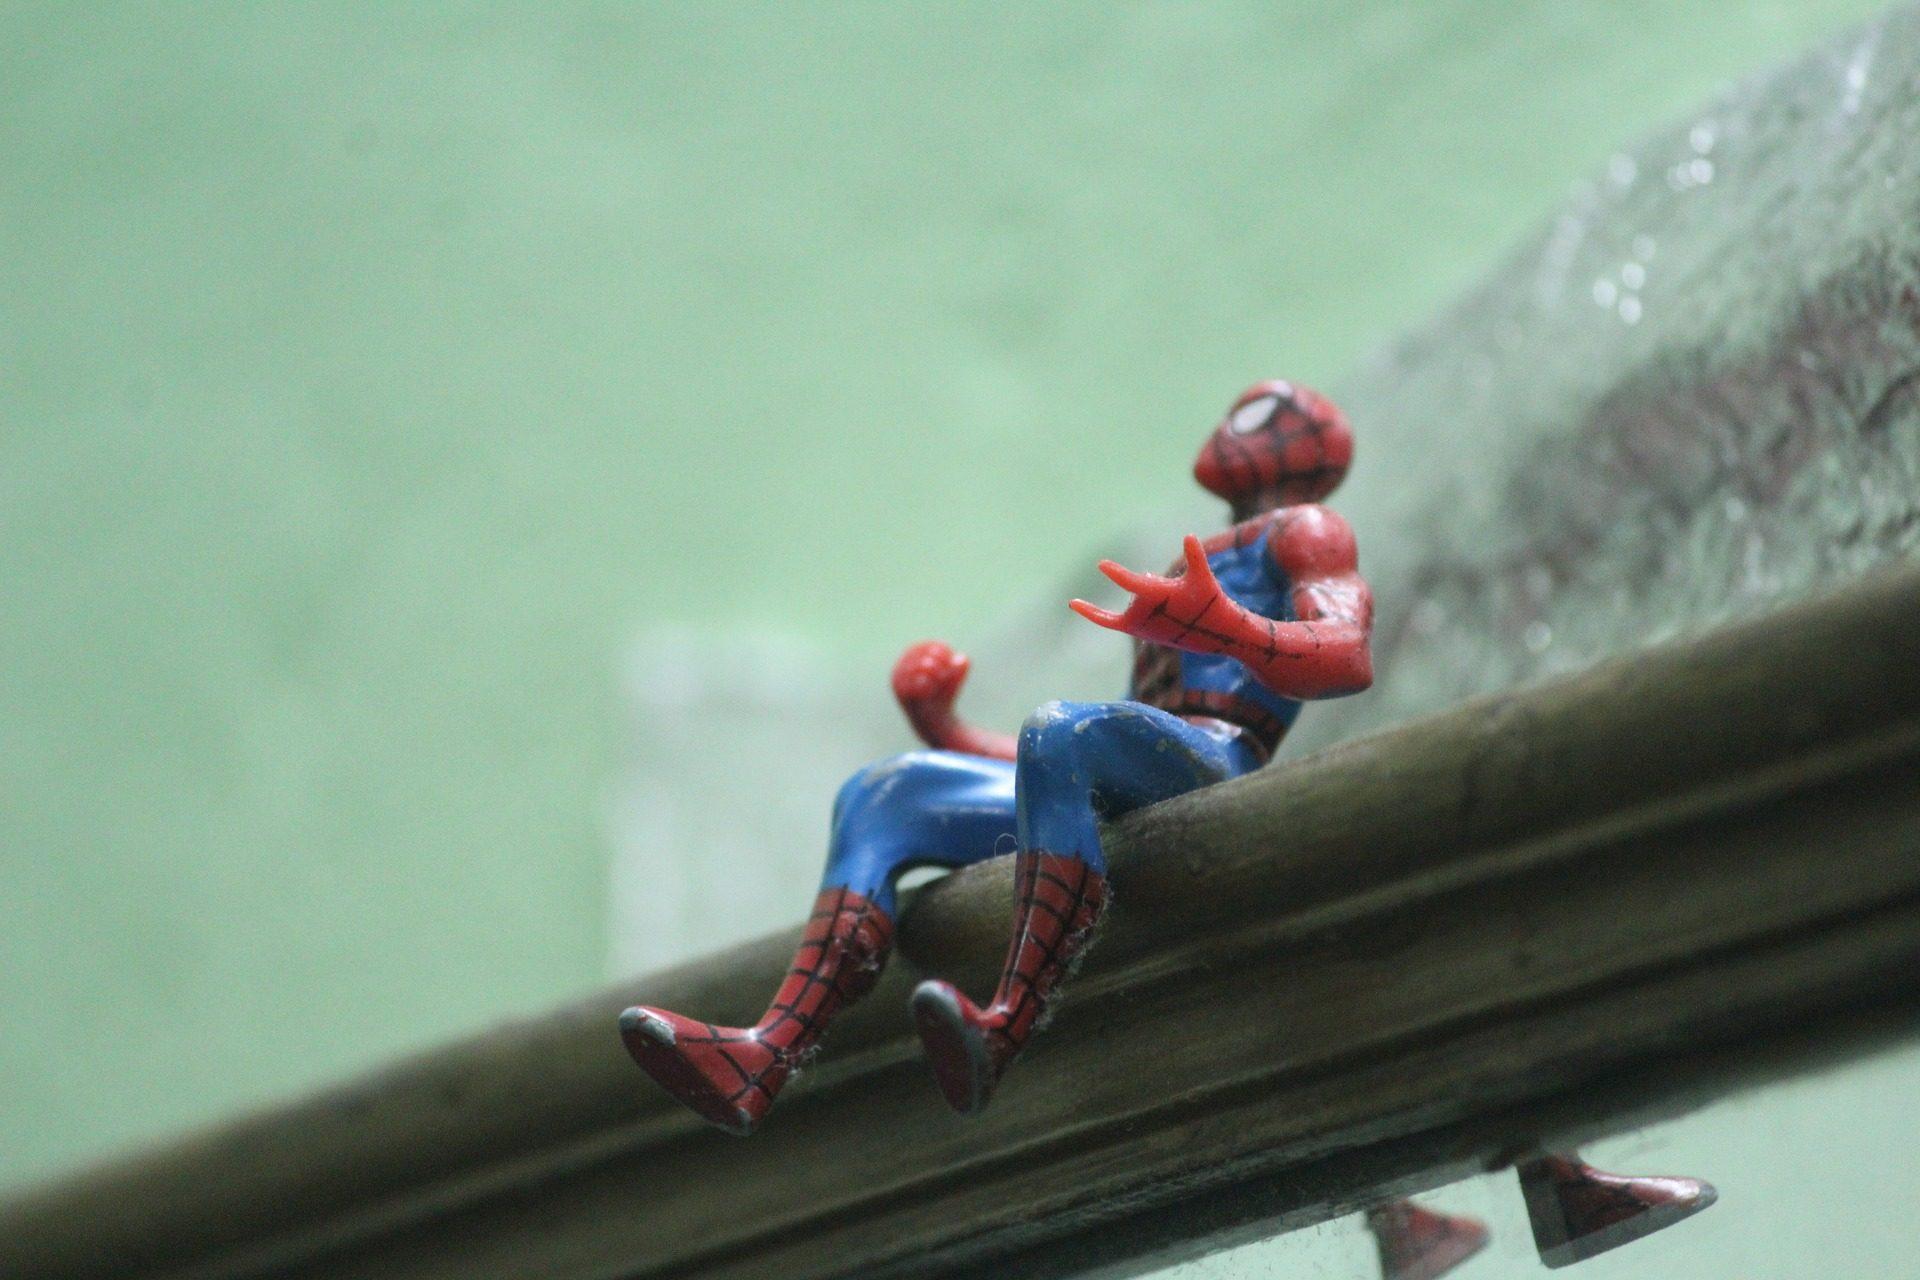 spiderman, υπερήρωα, Παιχνίδι, χιονάνθρωπος, Σχήμα - Wallpapers HD - Professor-falken.com